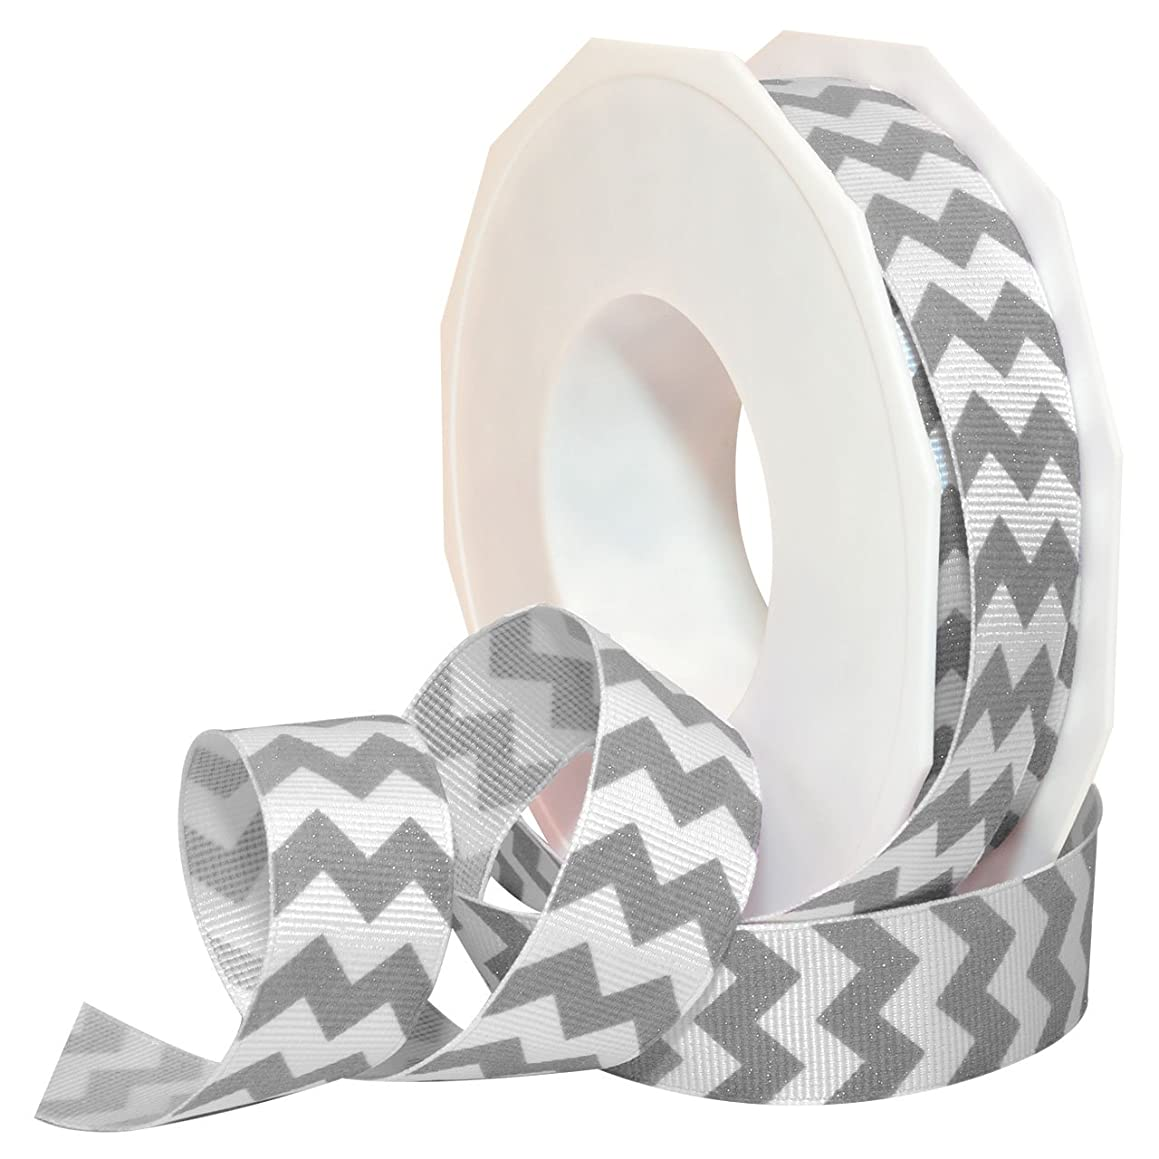 Morex Ribbon 98122/20-124 Polyester Sugar Chevron Ribbon, 7/8-Inch by 20-Yard, Platinum